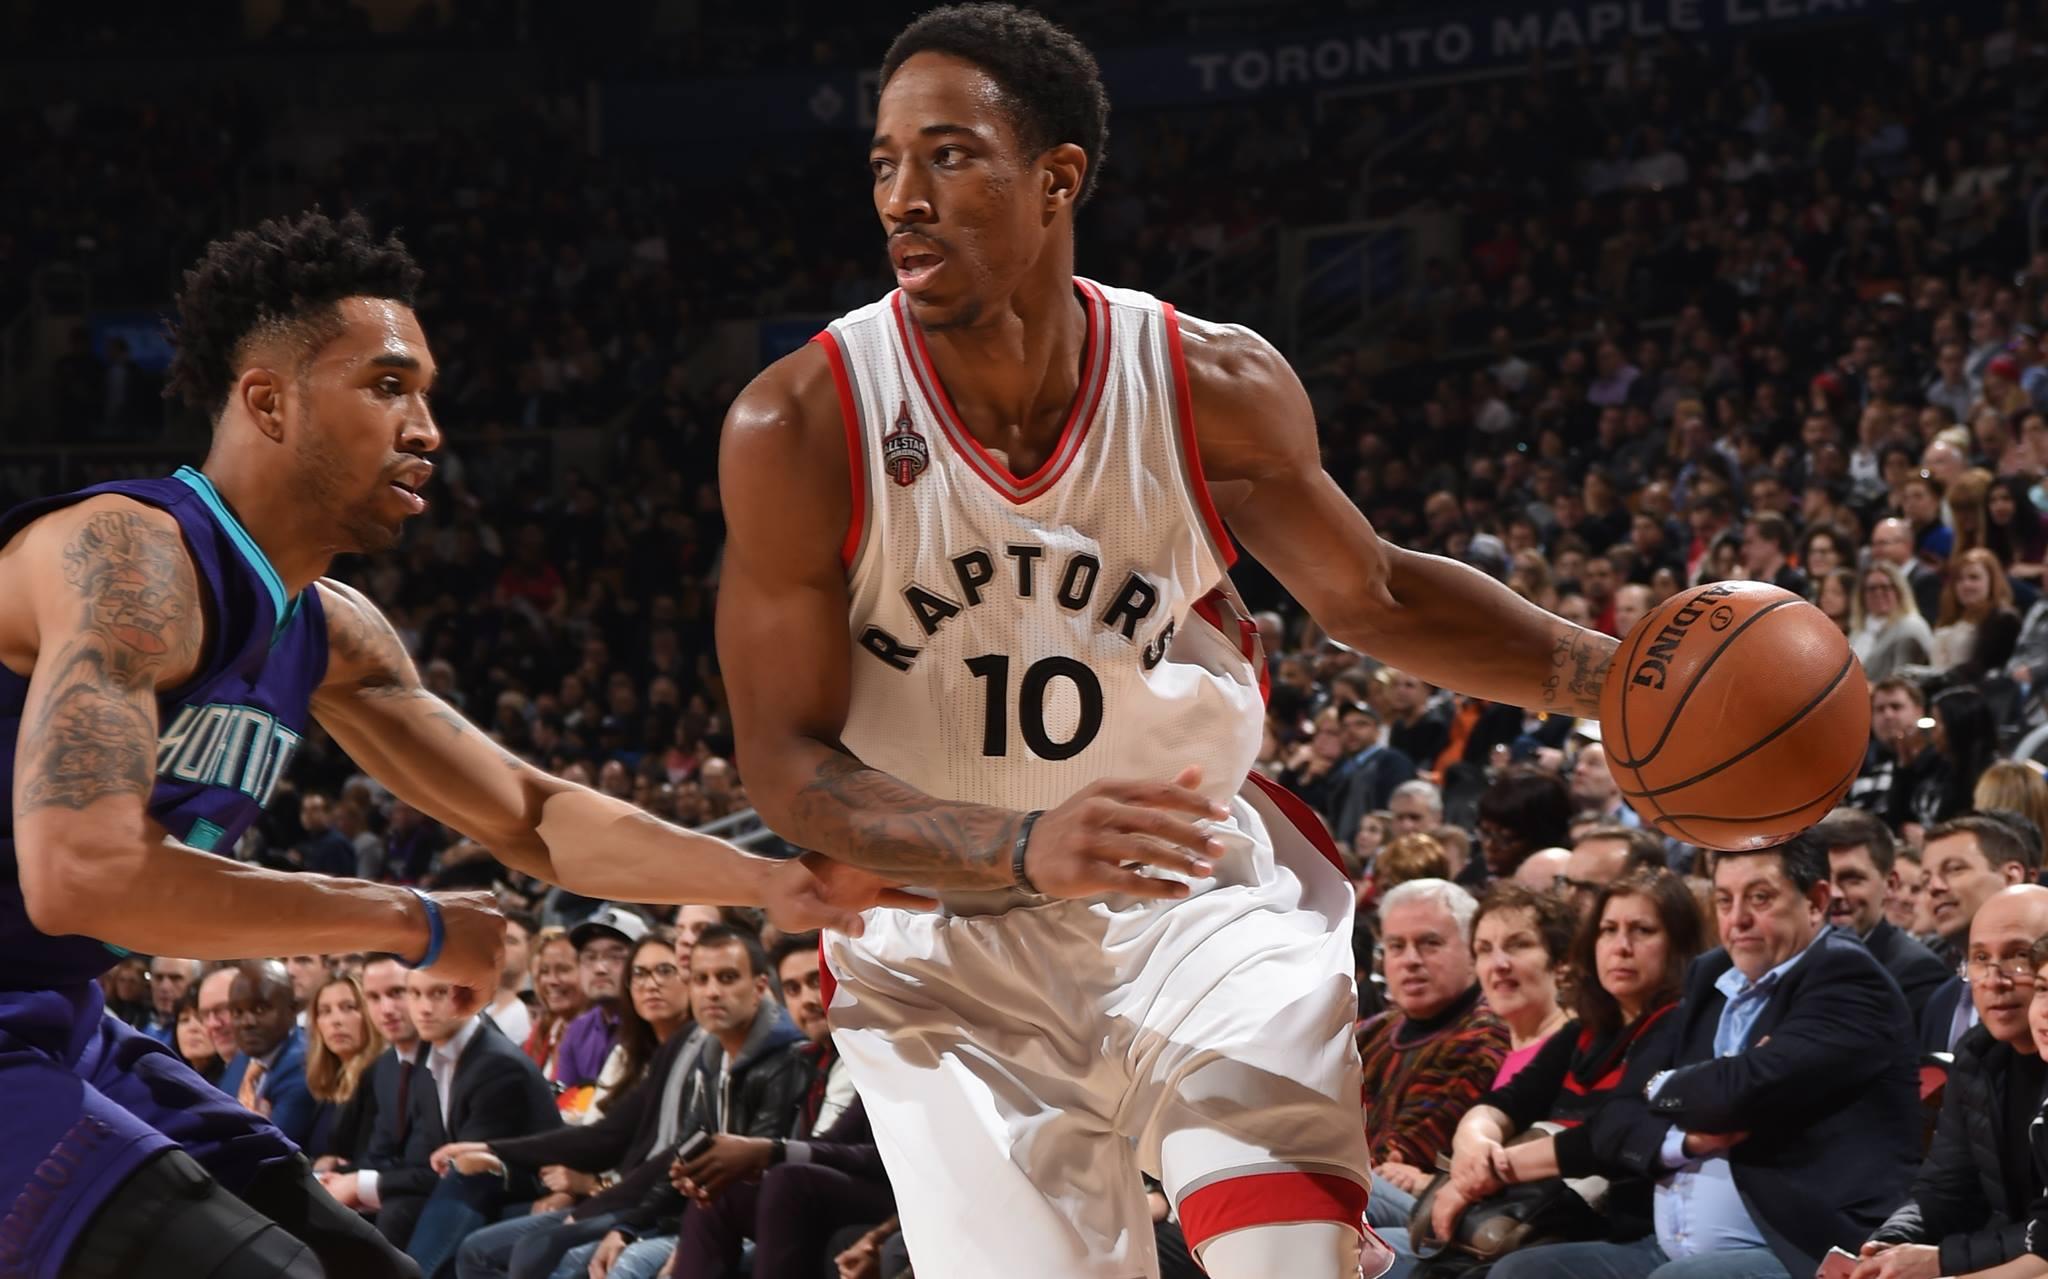 Image: Toronto Raptors / Facebook